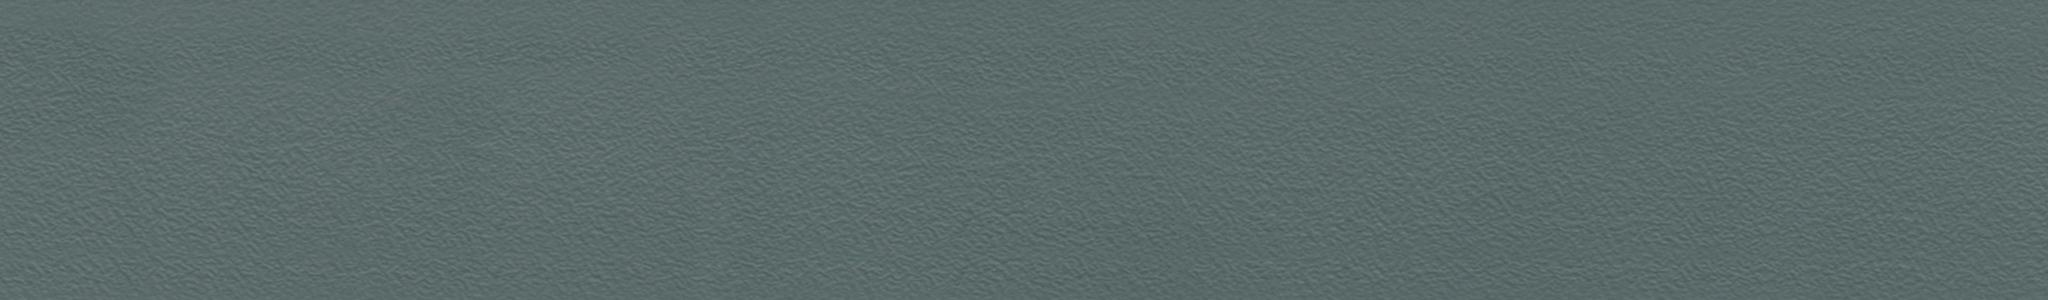 HU 169108 ABS hrana zelená perla XG